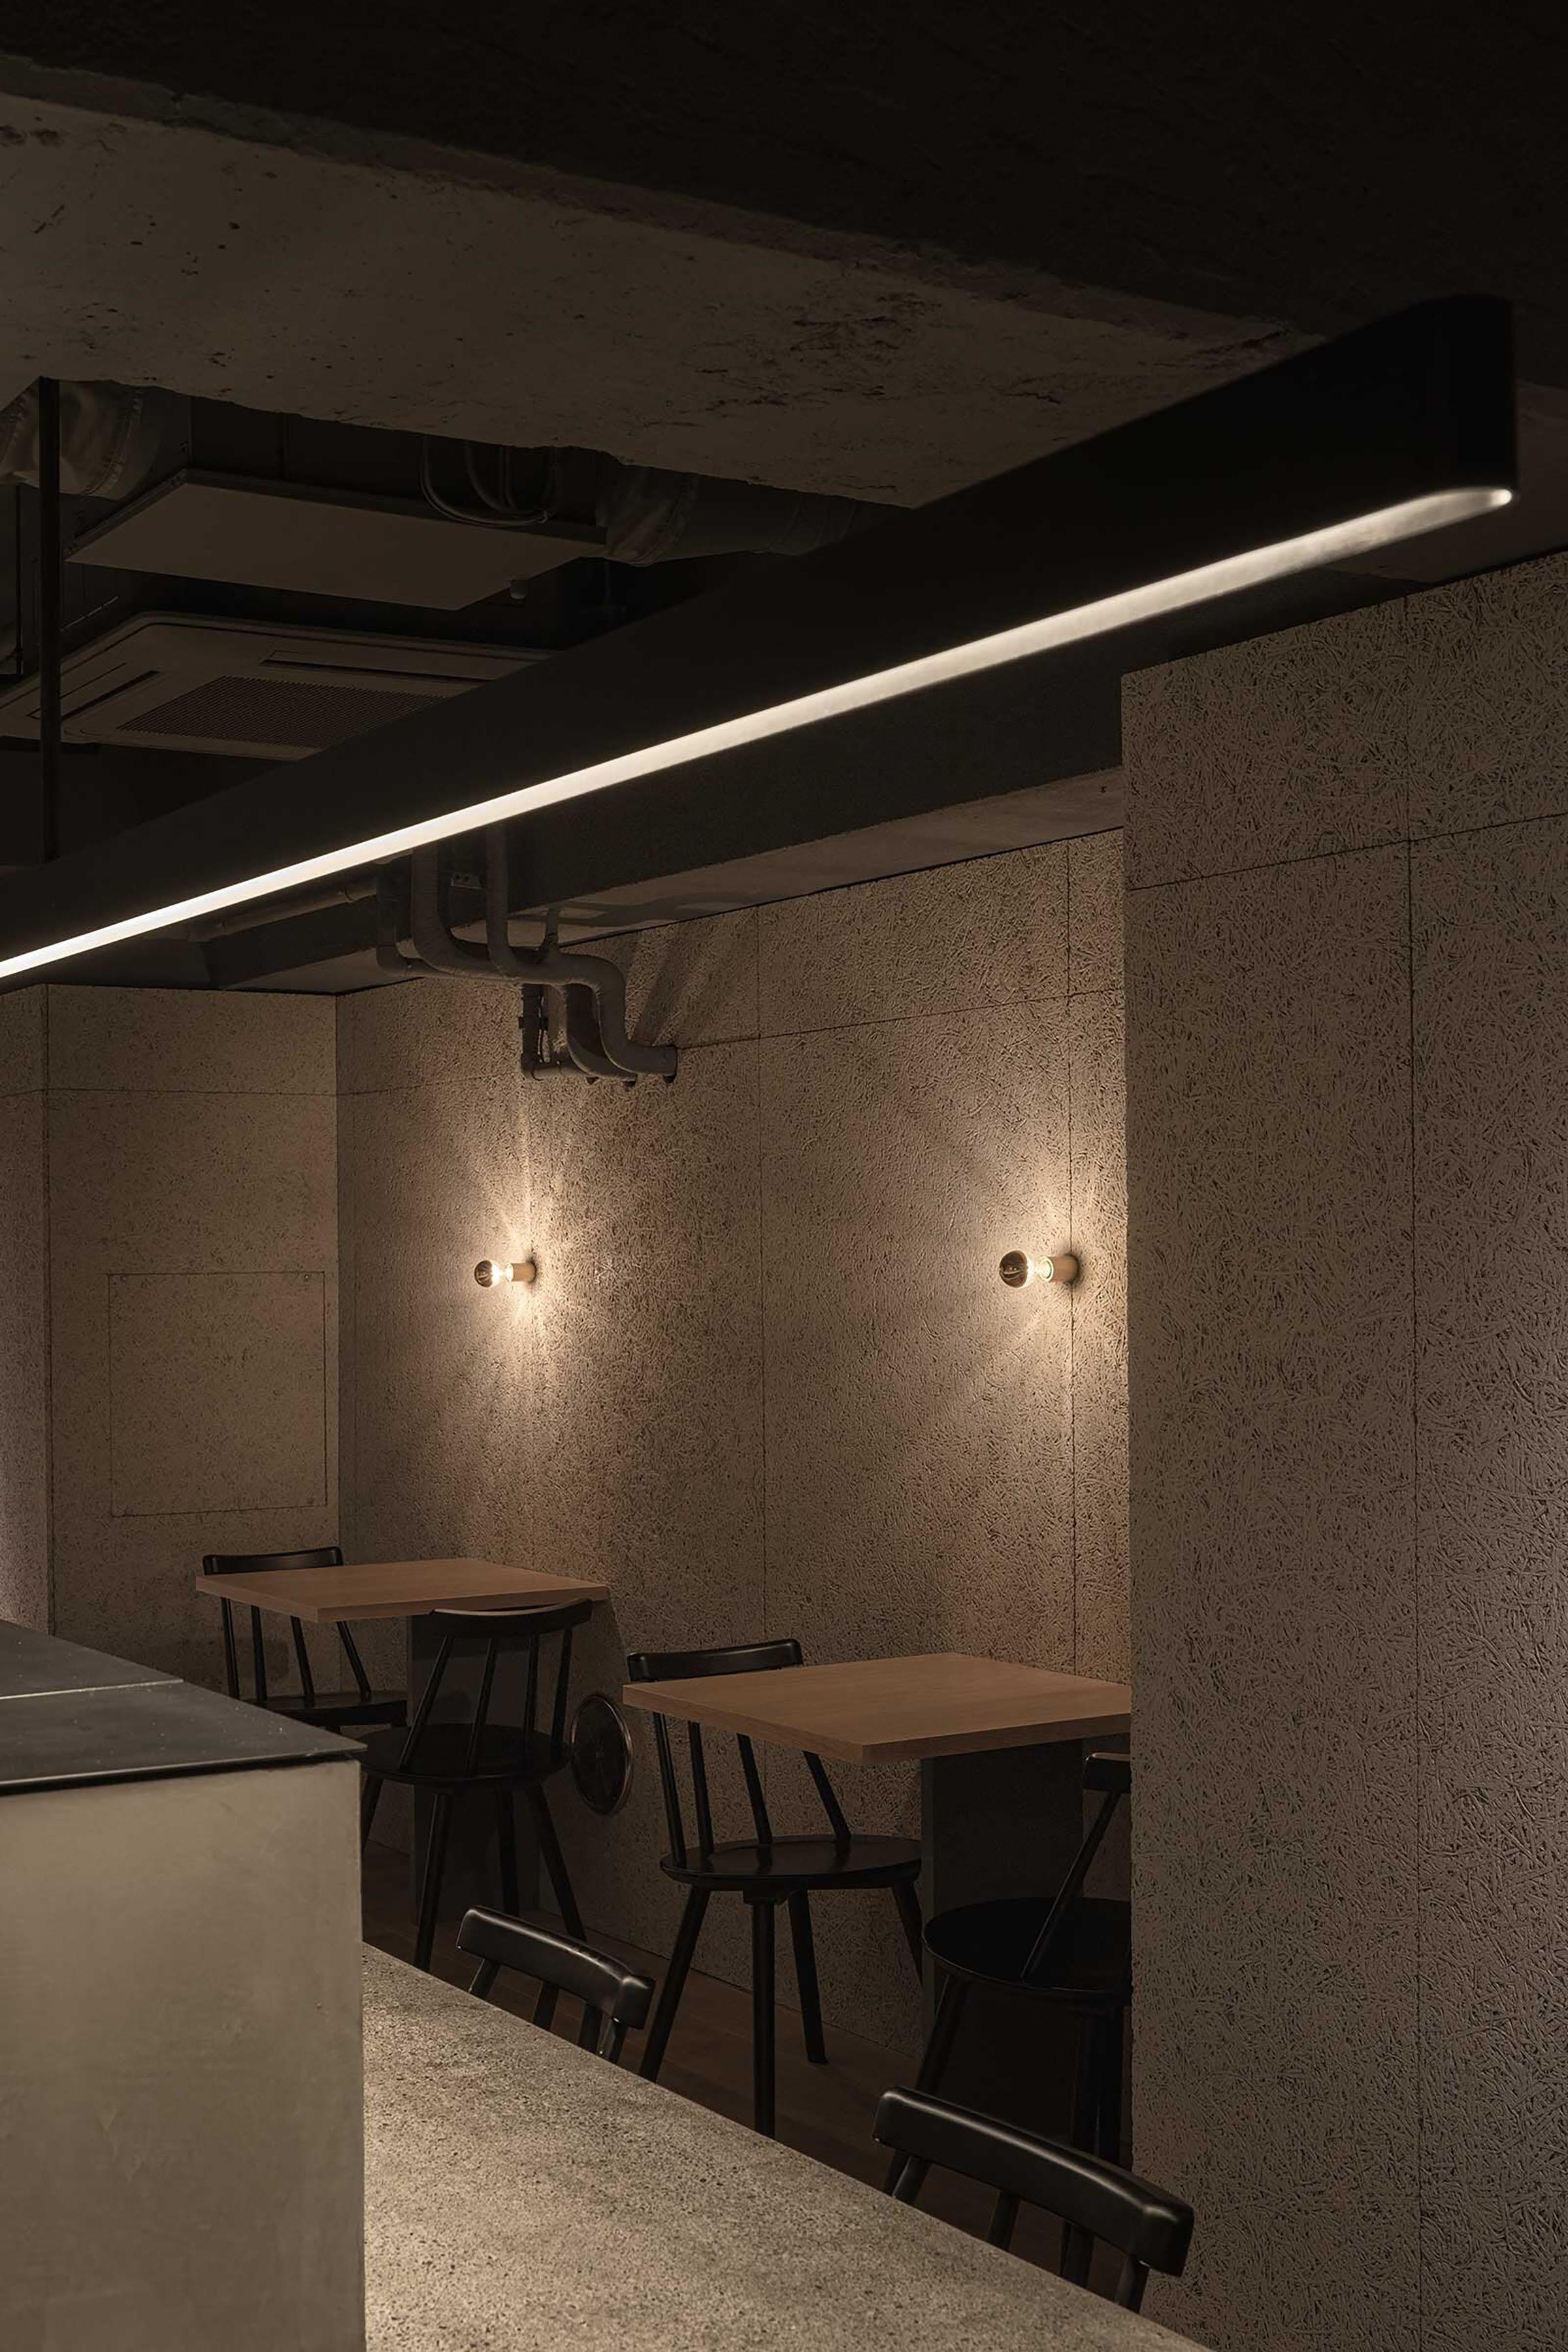 Grillno Restaurant | Designed by Keiji Ashizawa | Softer Volumes